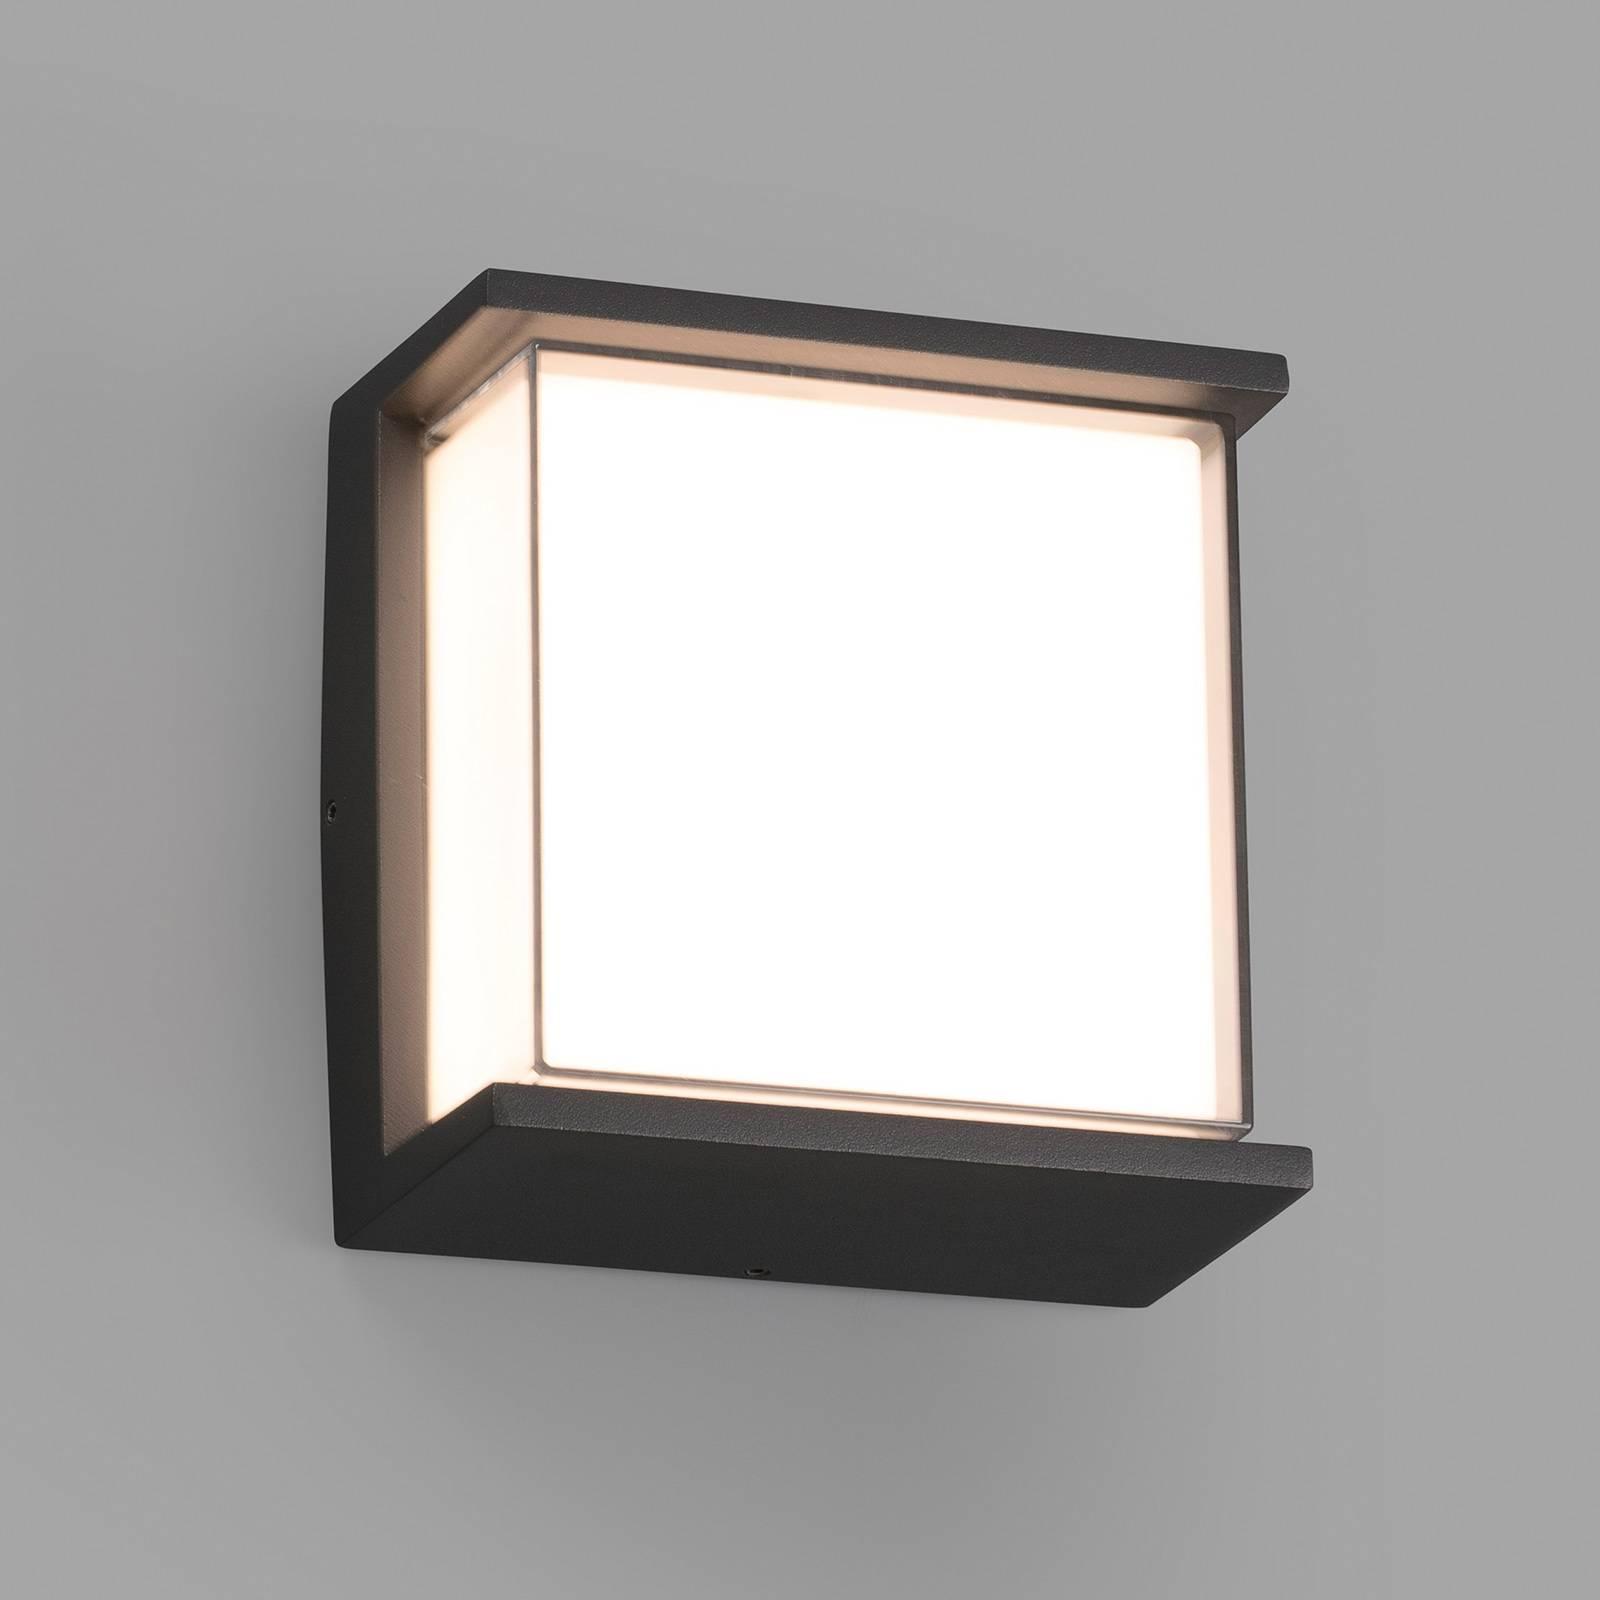 LED-Außenwandleuchte Hikari, IK10